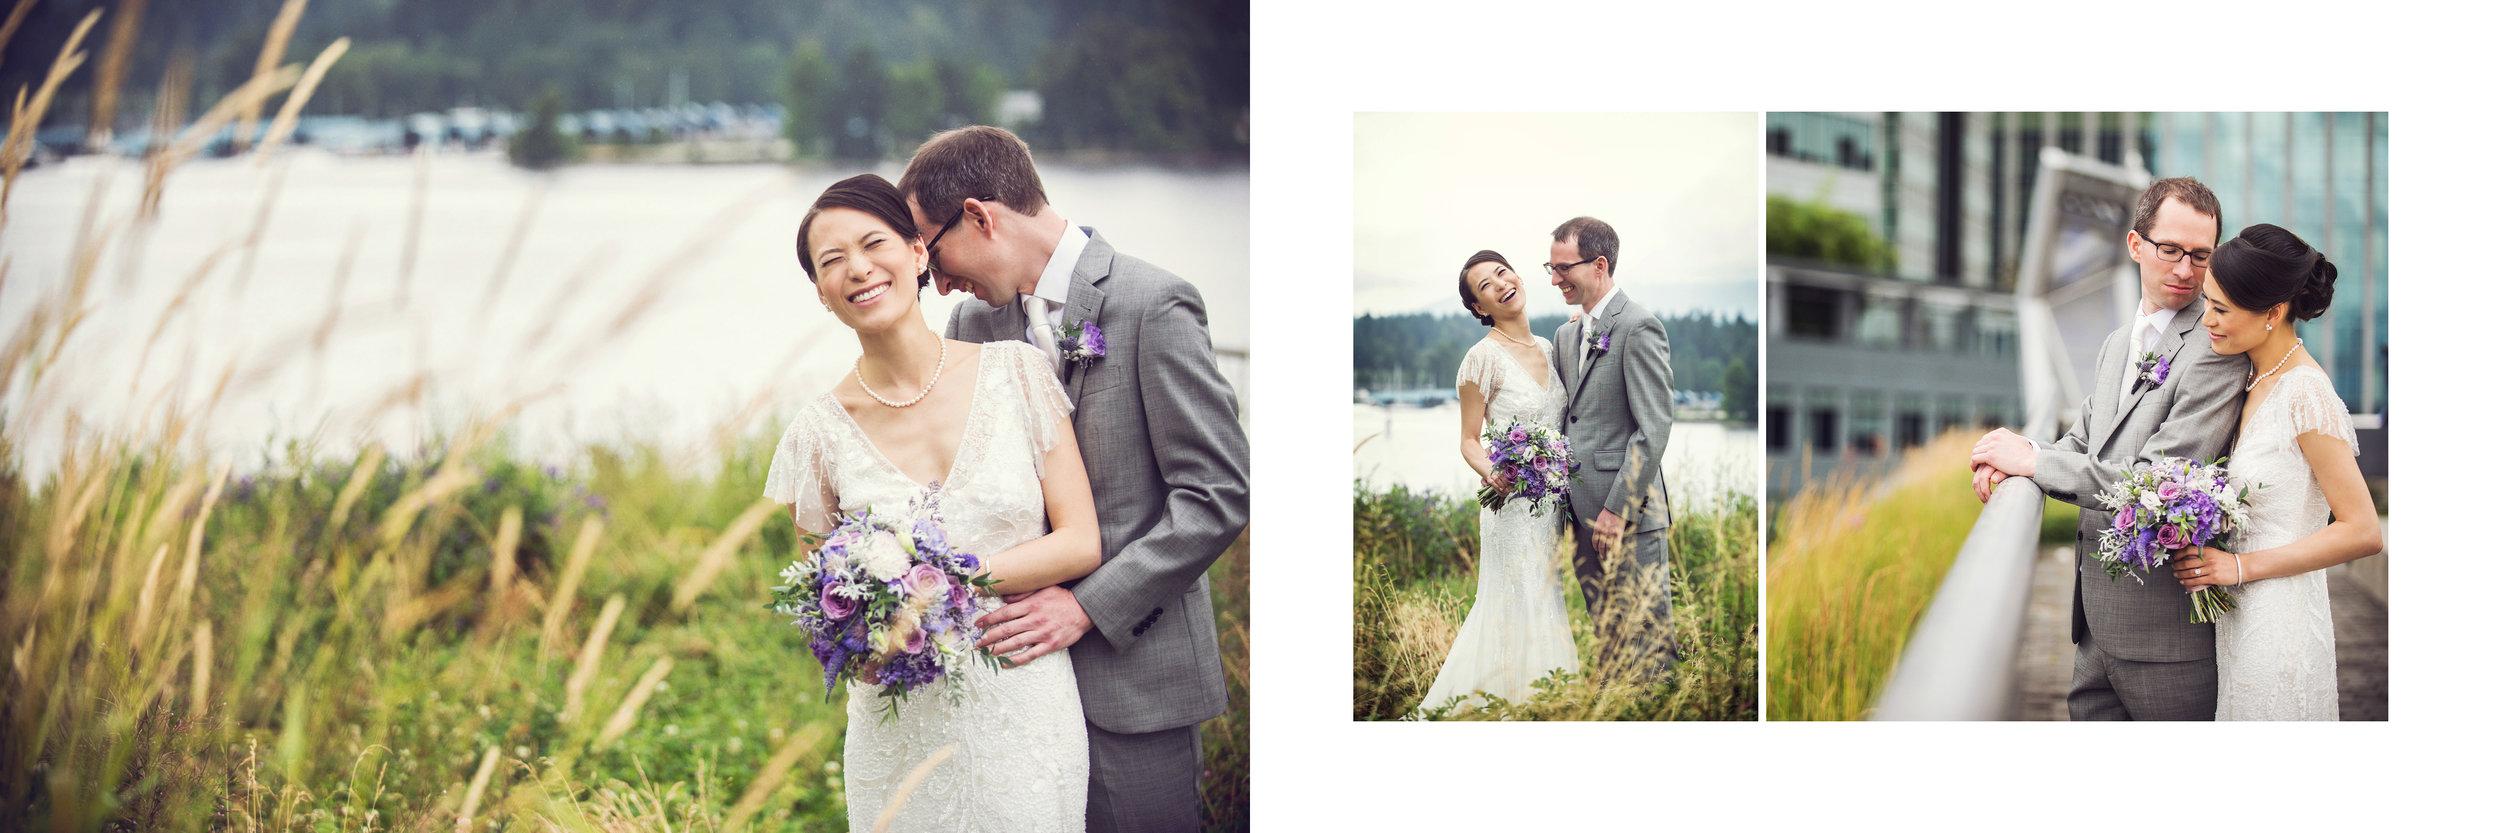 Andrea-Reuben-Grouse-Mountain-Wedding-Real-Weddings-Feature-Yaletown-Photography-007.jpg